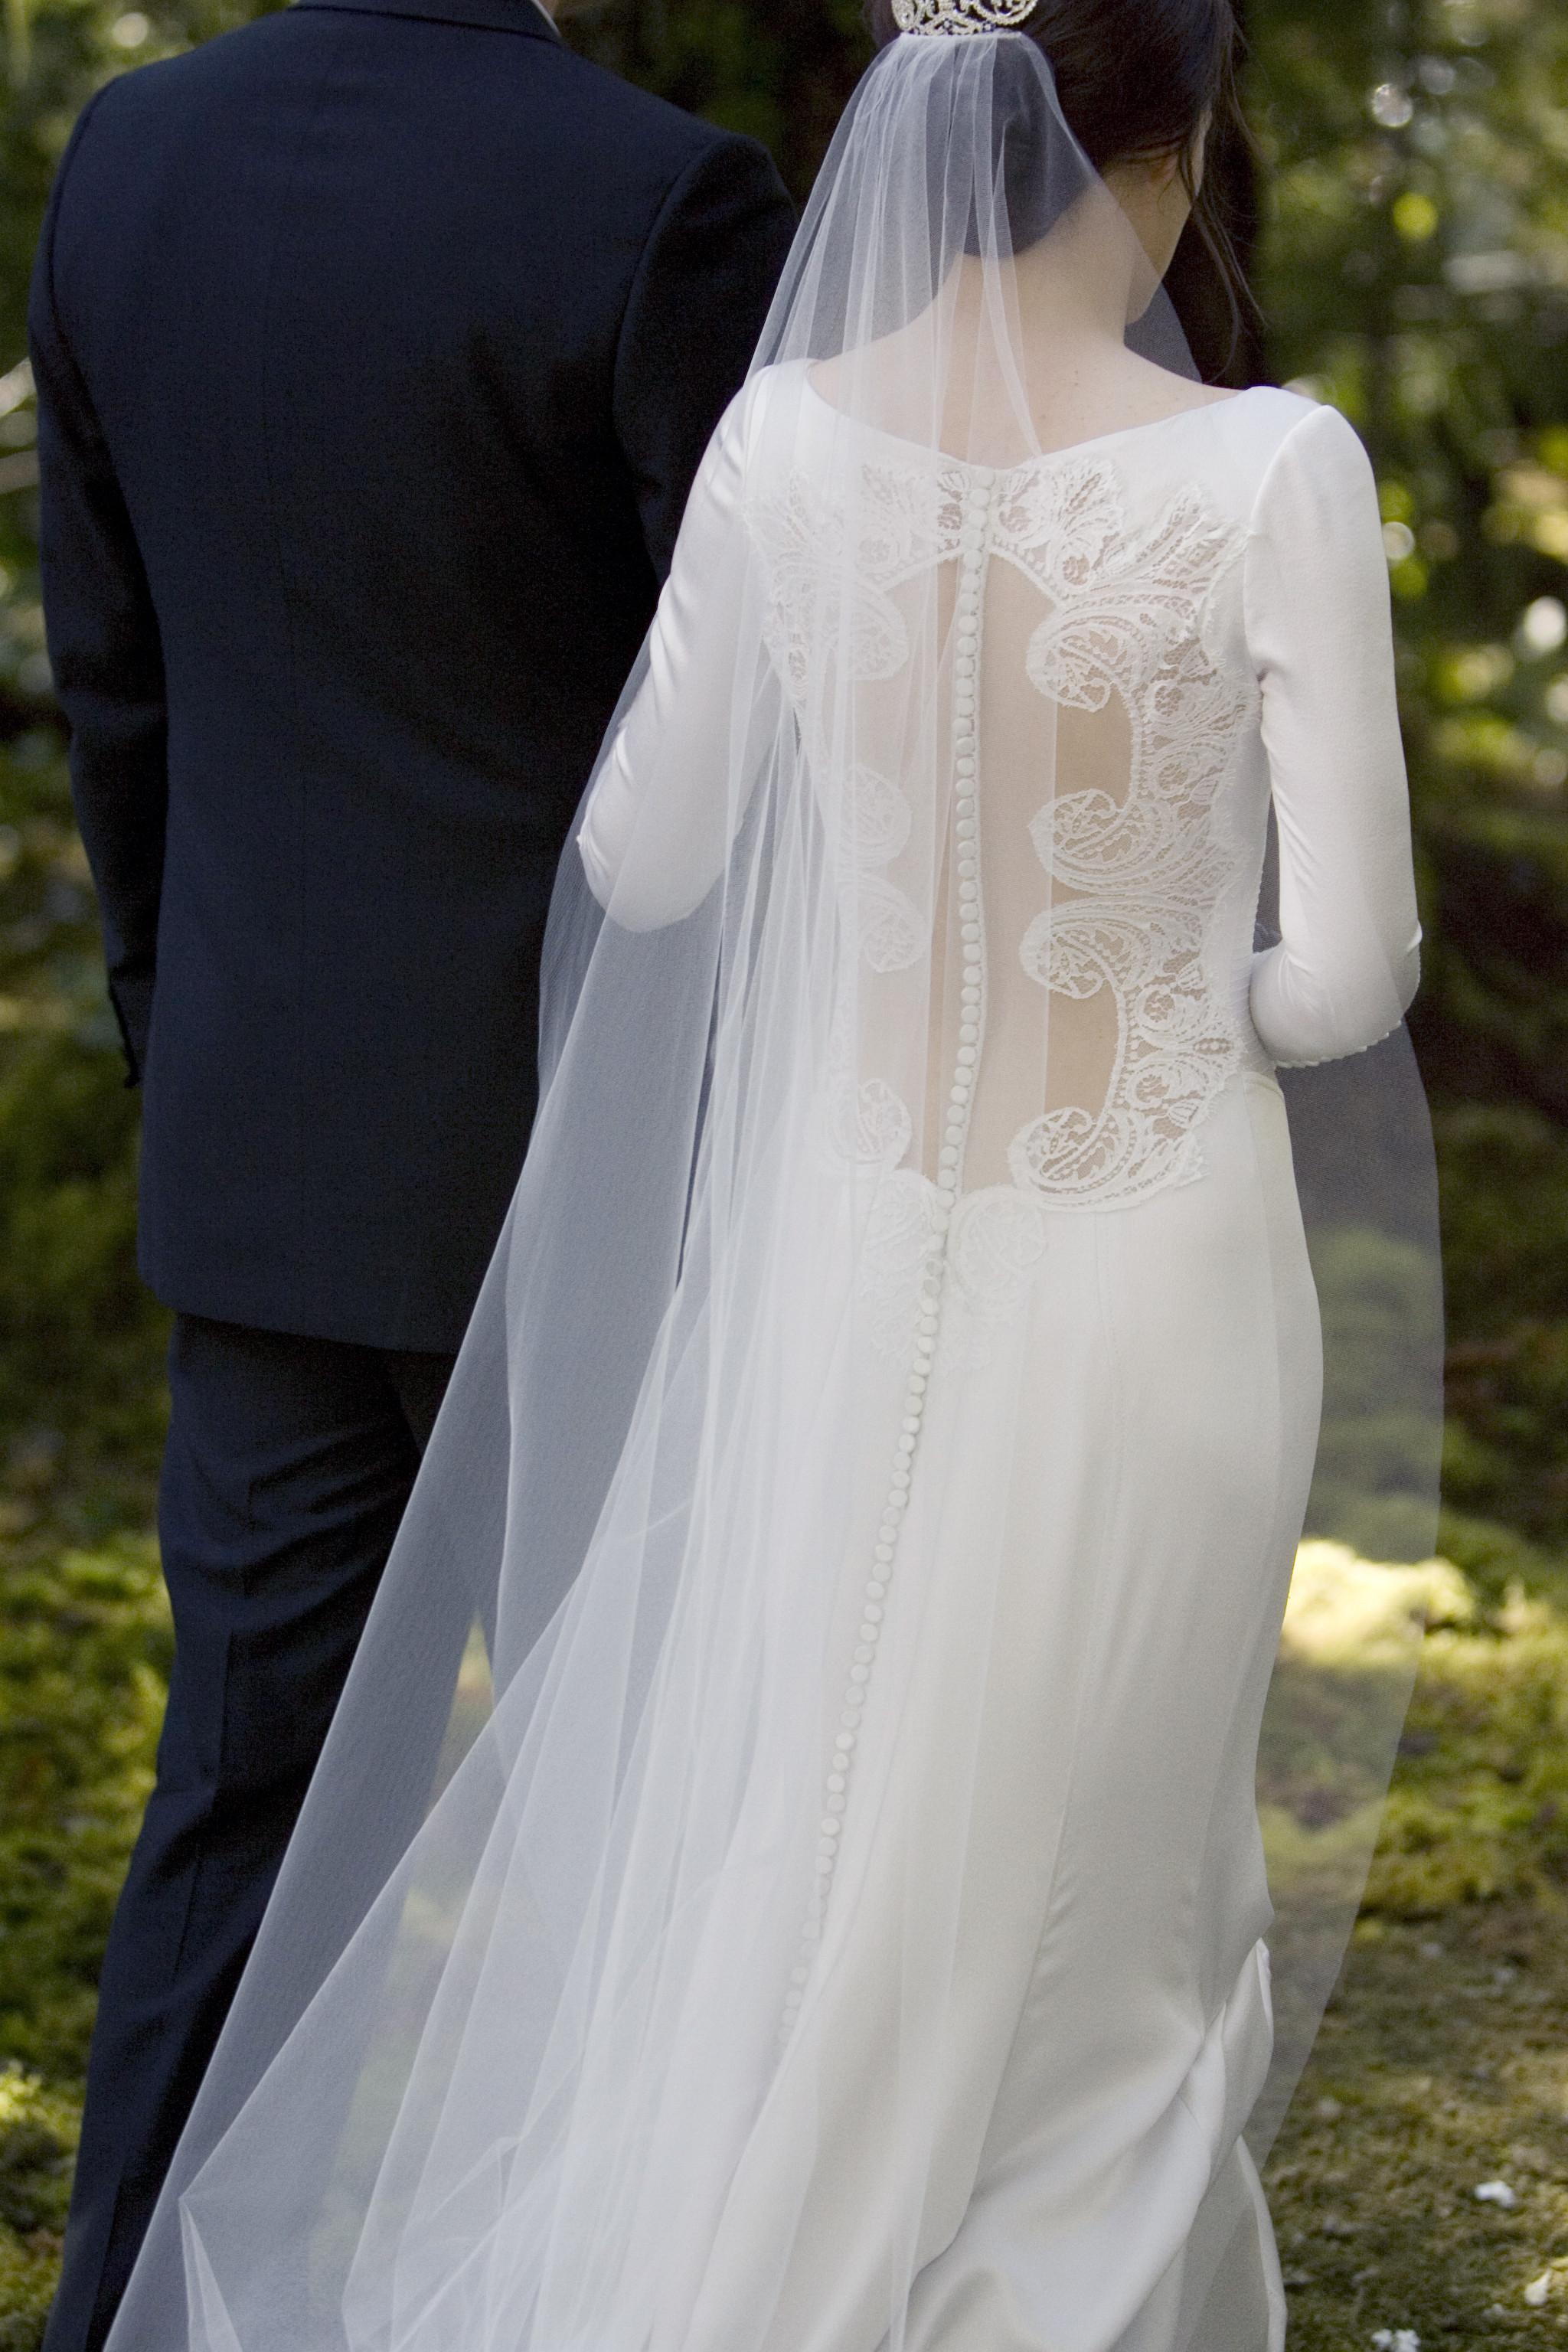 Carolina_Herrera_New_York_Twilight_wedding_gown_Bella_Swan_Nov2011_2.jpg